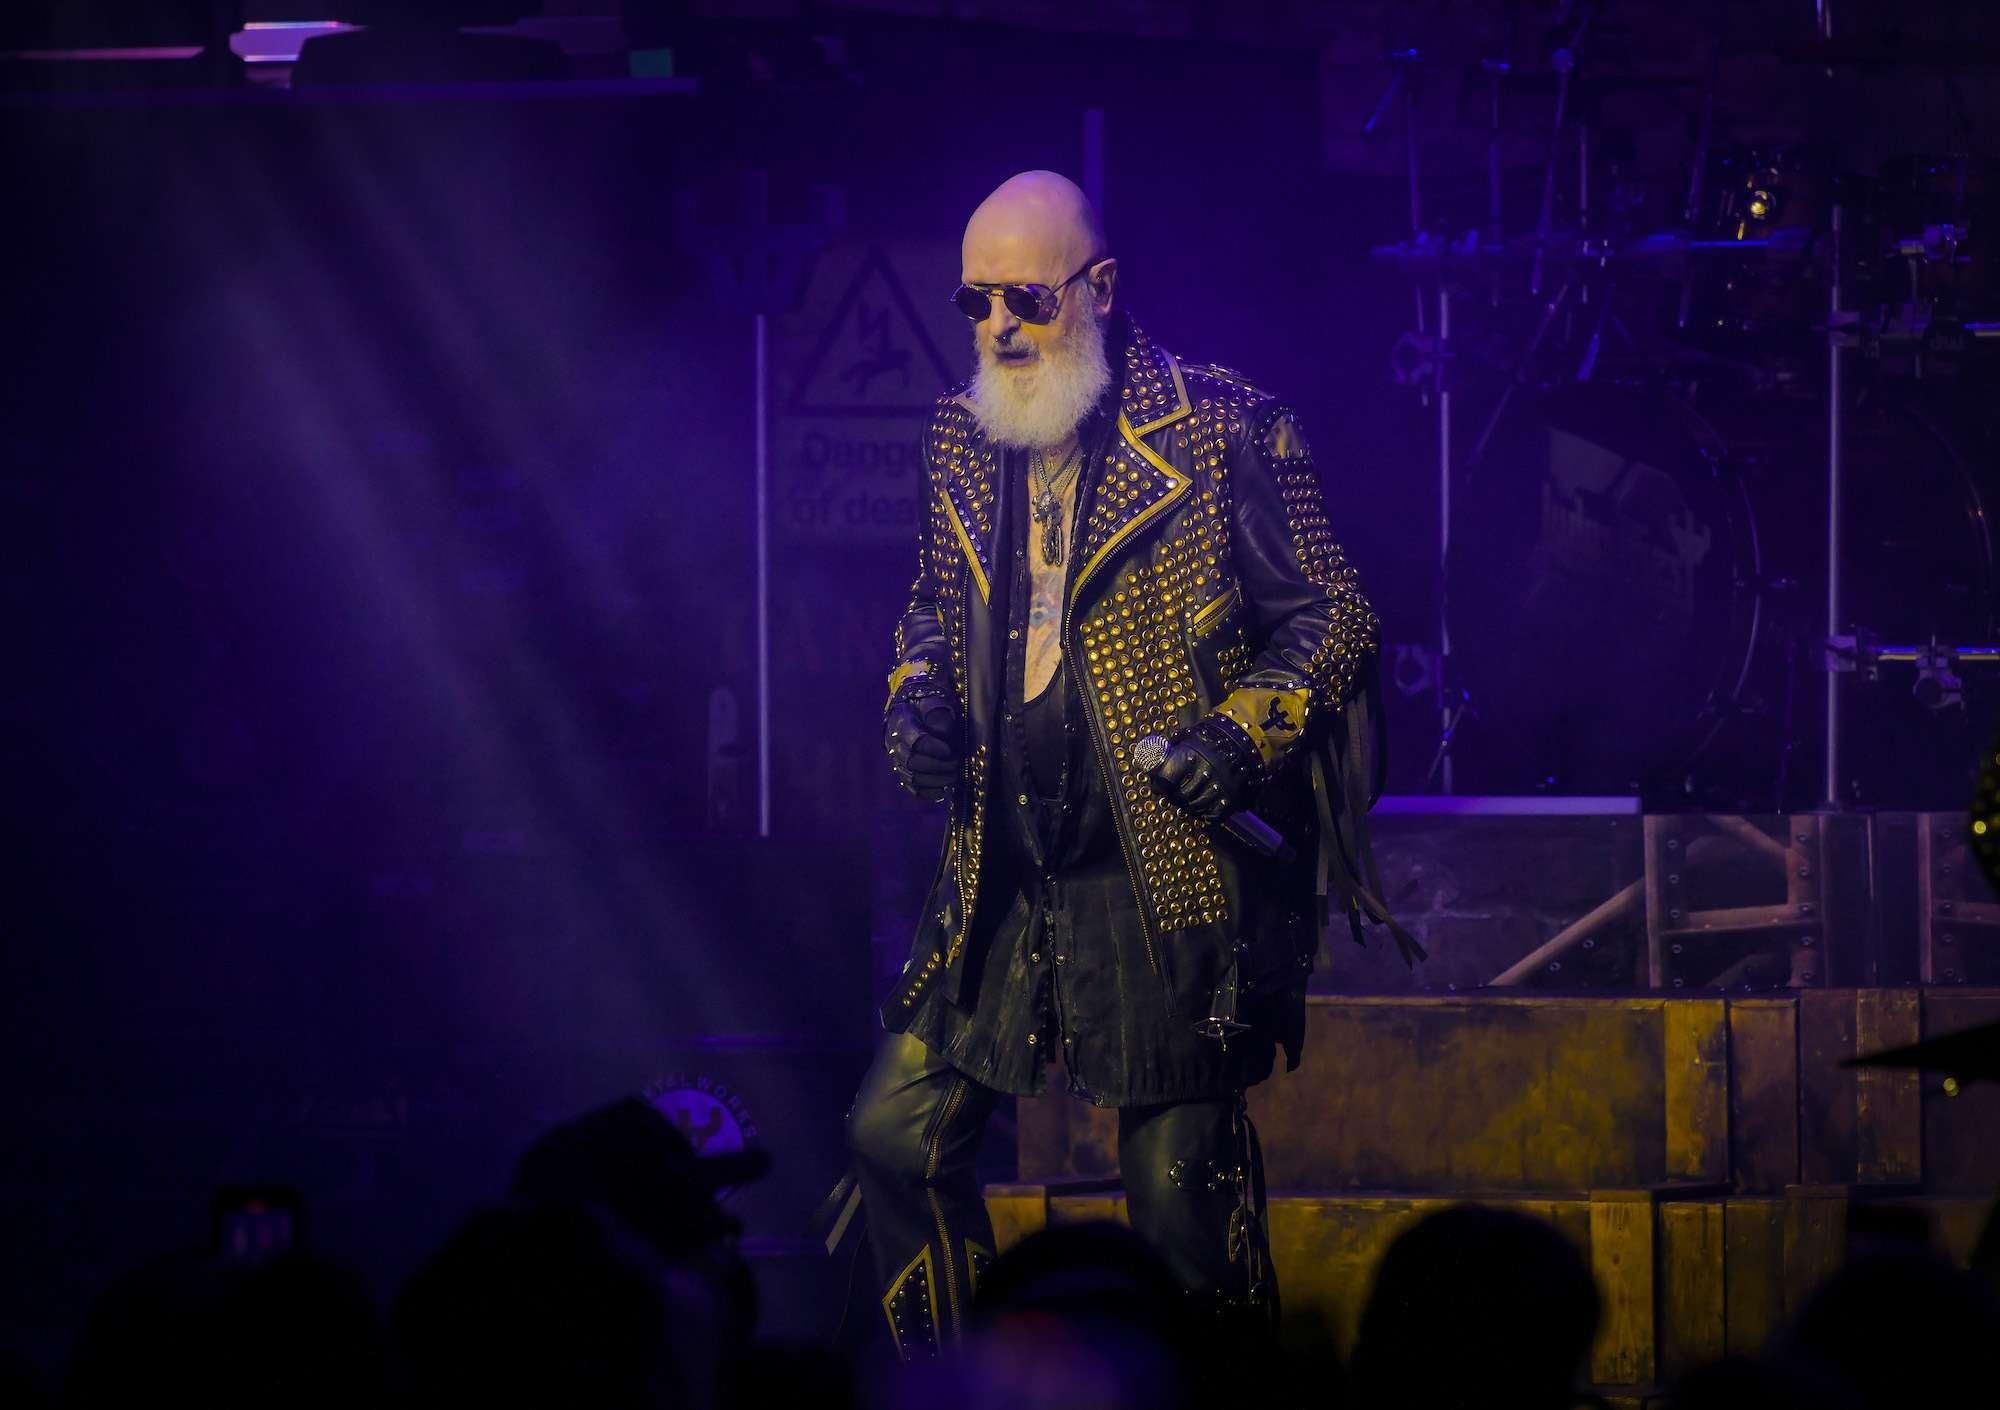 Judas Priest Live at Rosemont Theatre [GALLERY] 19